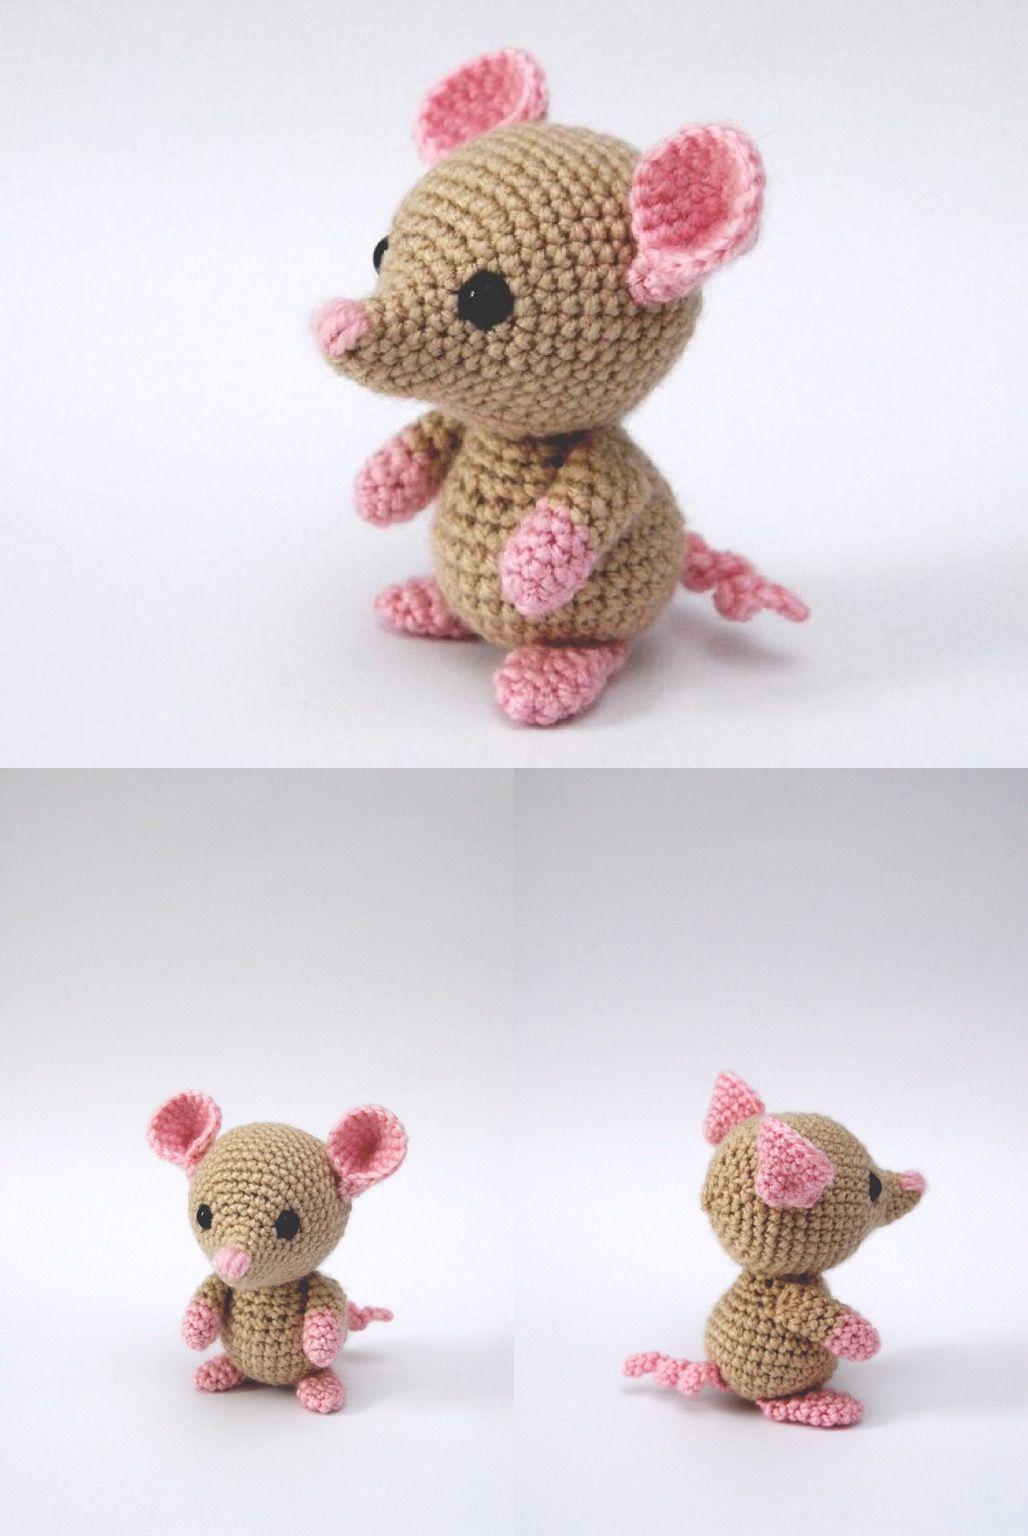 Baby Amigurumi Mouse-Crochet Mouse-Newborn Gift-Ha